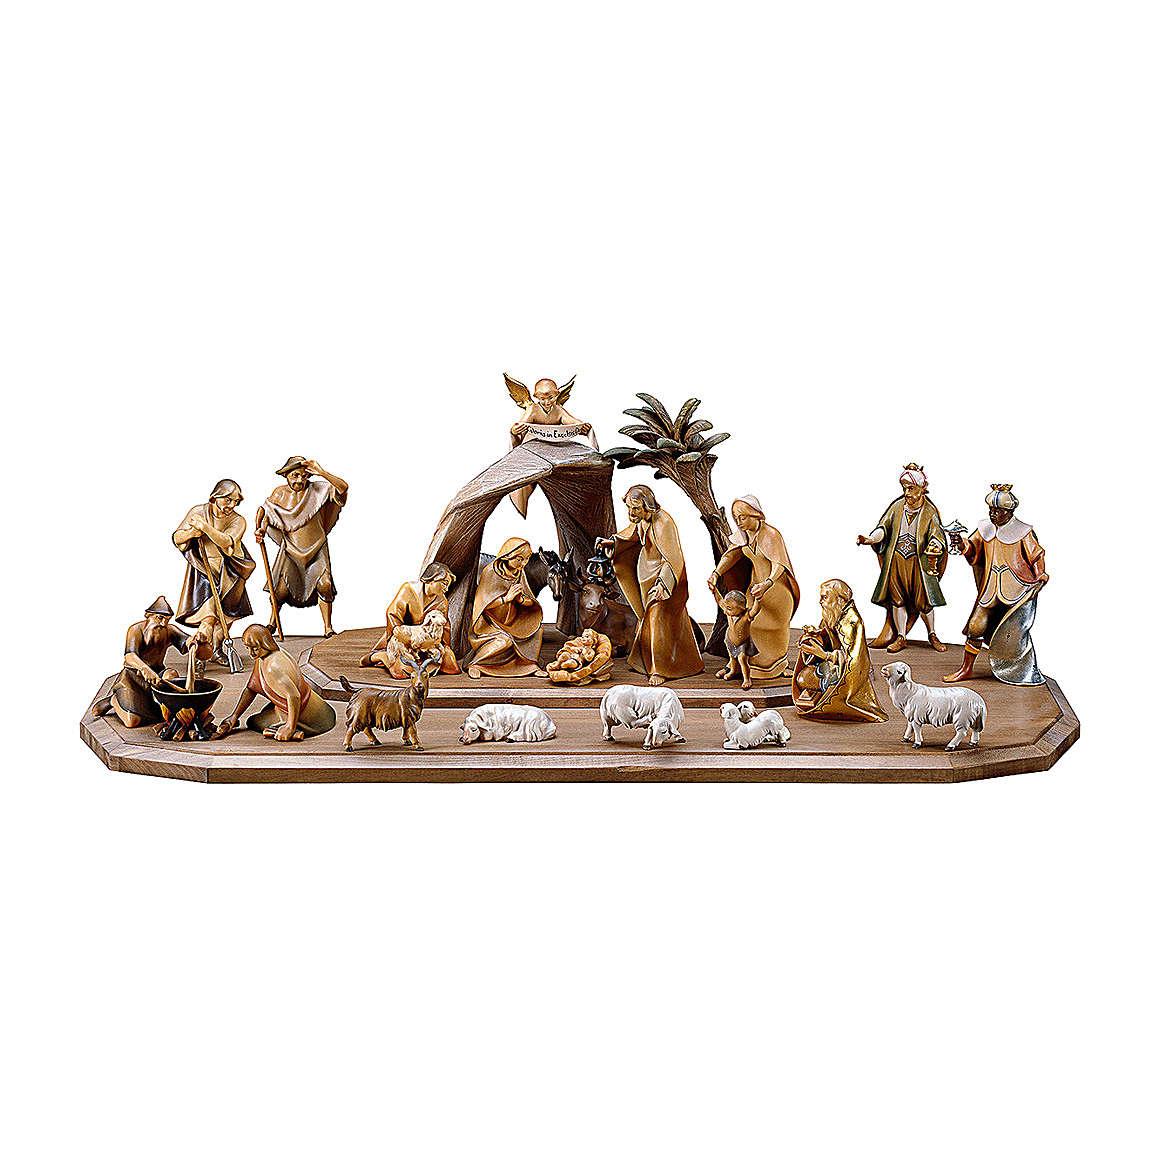 Belén cabaña Redentor modelo Original Redentor madera pintada Val Gardena 12 cm de altura media - 21 piezas 4